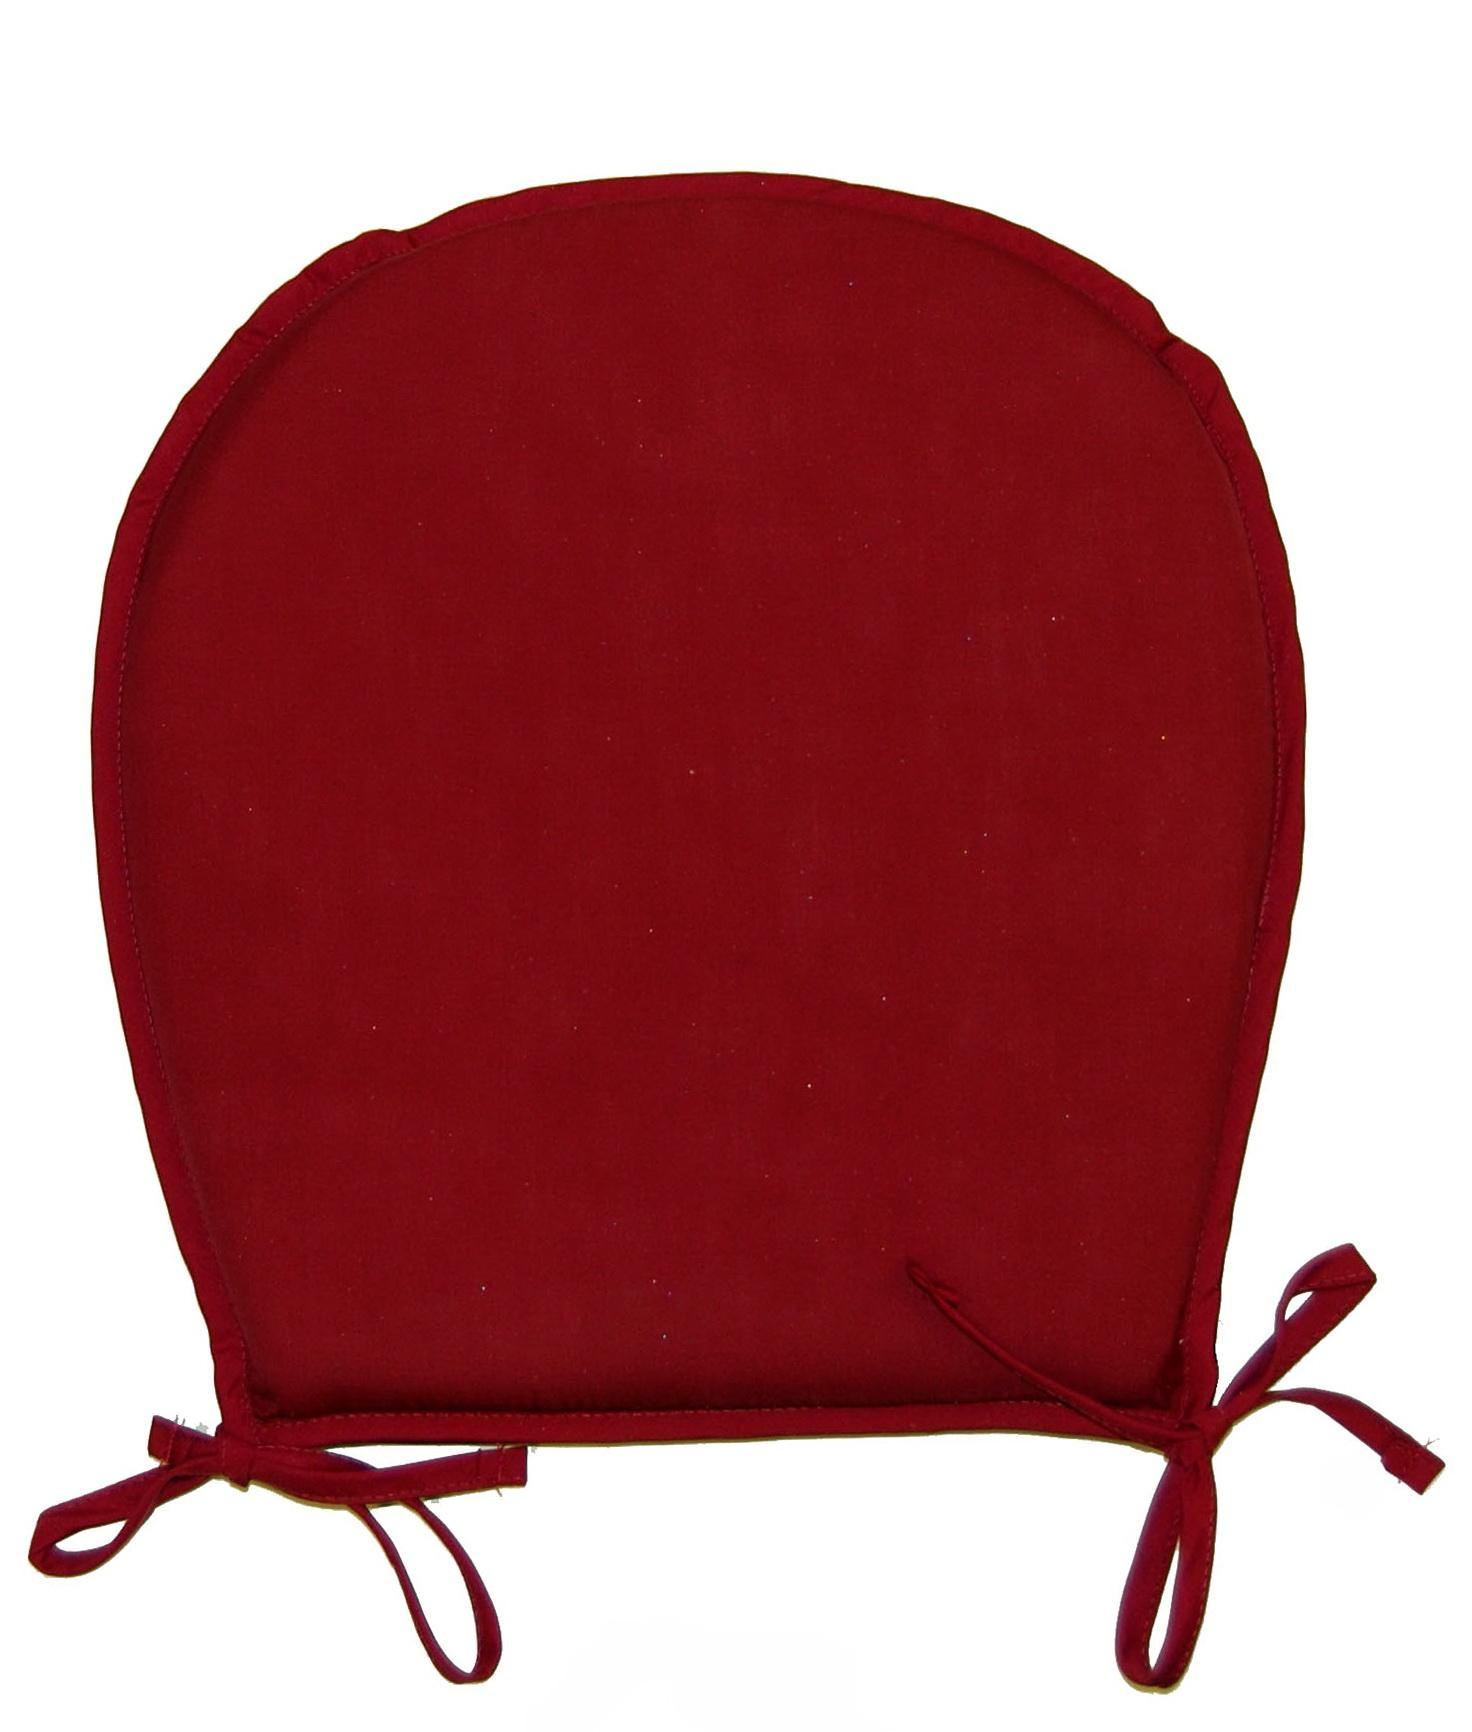 Chair Cushions With Ties Ikea Home Design Ideas : chair cushions with ties ikea from www.zintaaistars.com size 1472 x 1732 jpeg 323kB